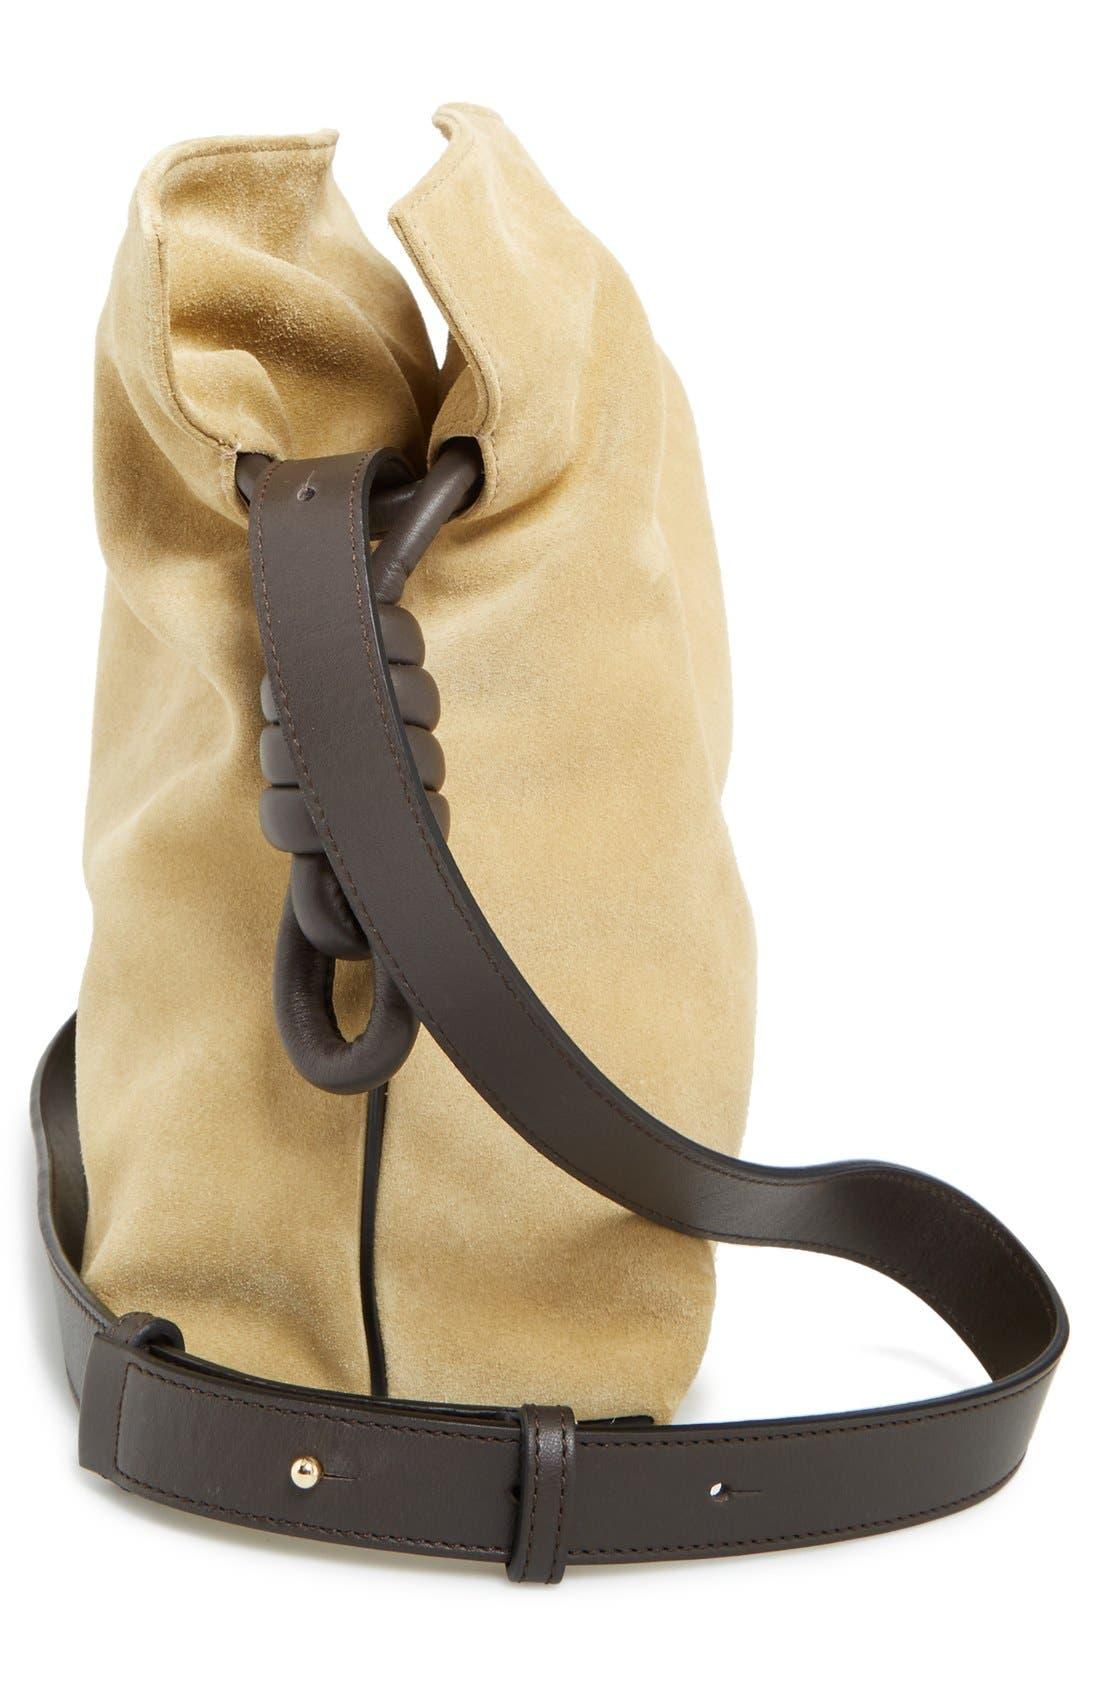 'Flamenco Knot' Suede & Calfskin Leather Bag,                             Alternate thumbnail 3, color,                             250